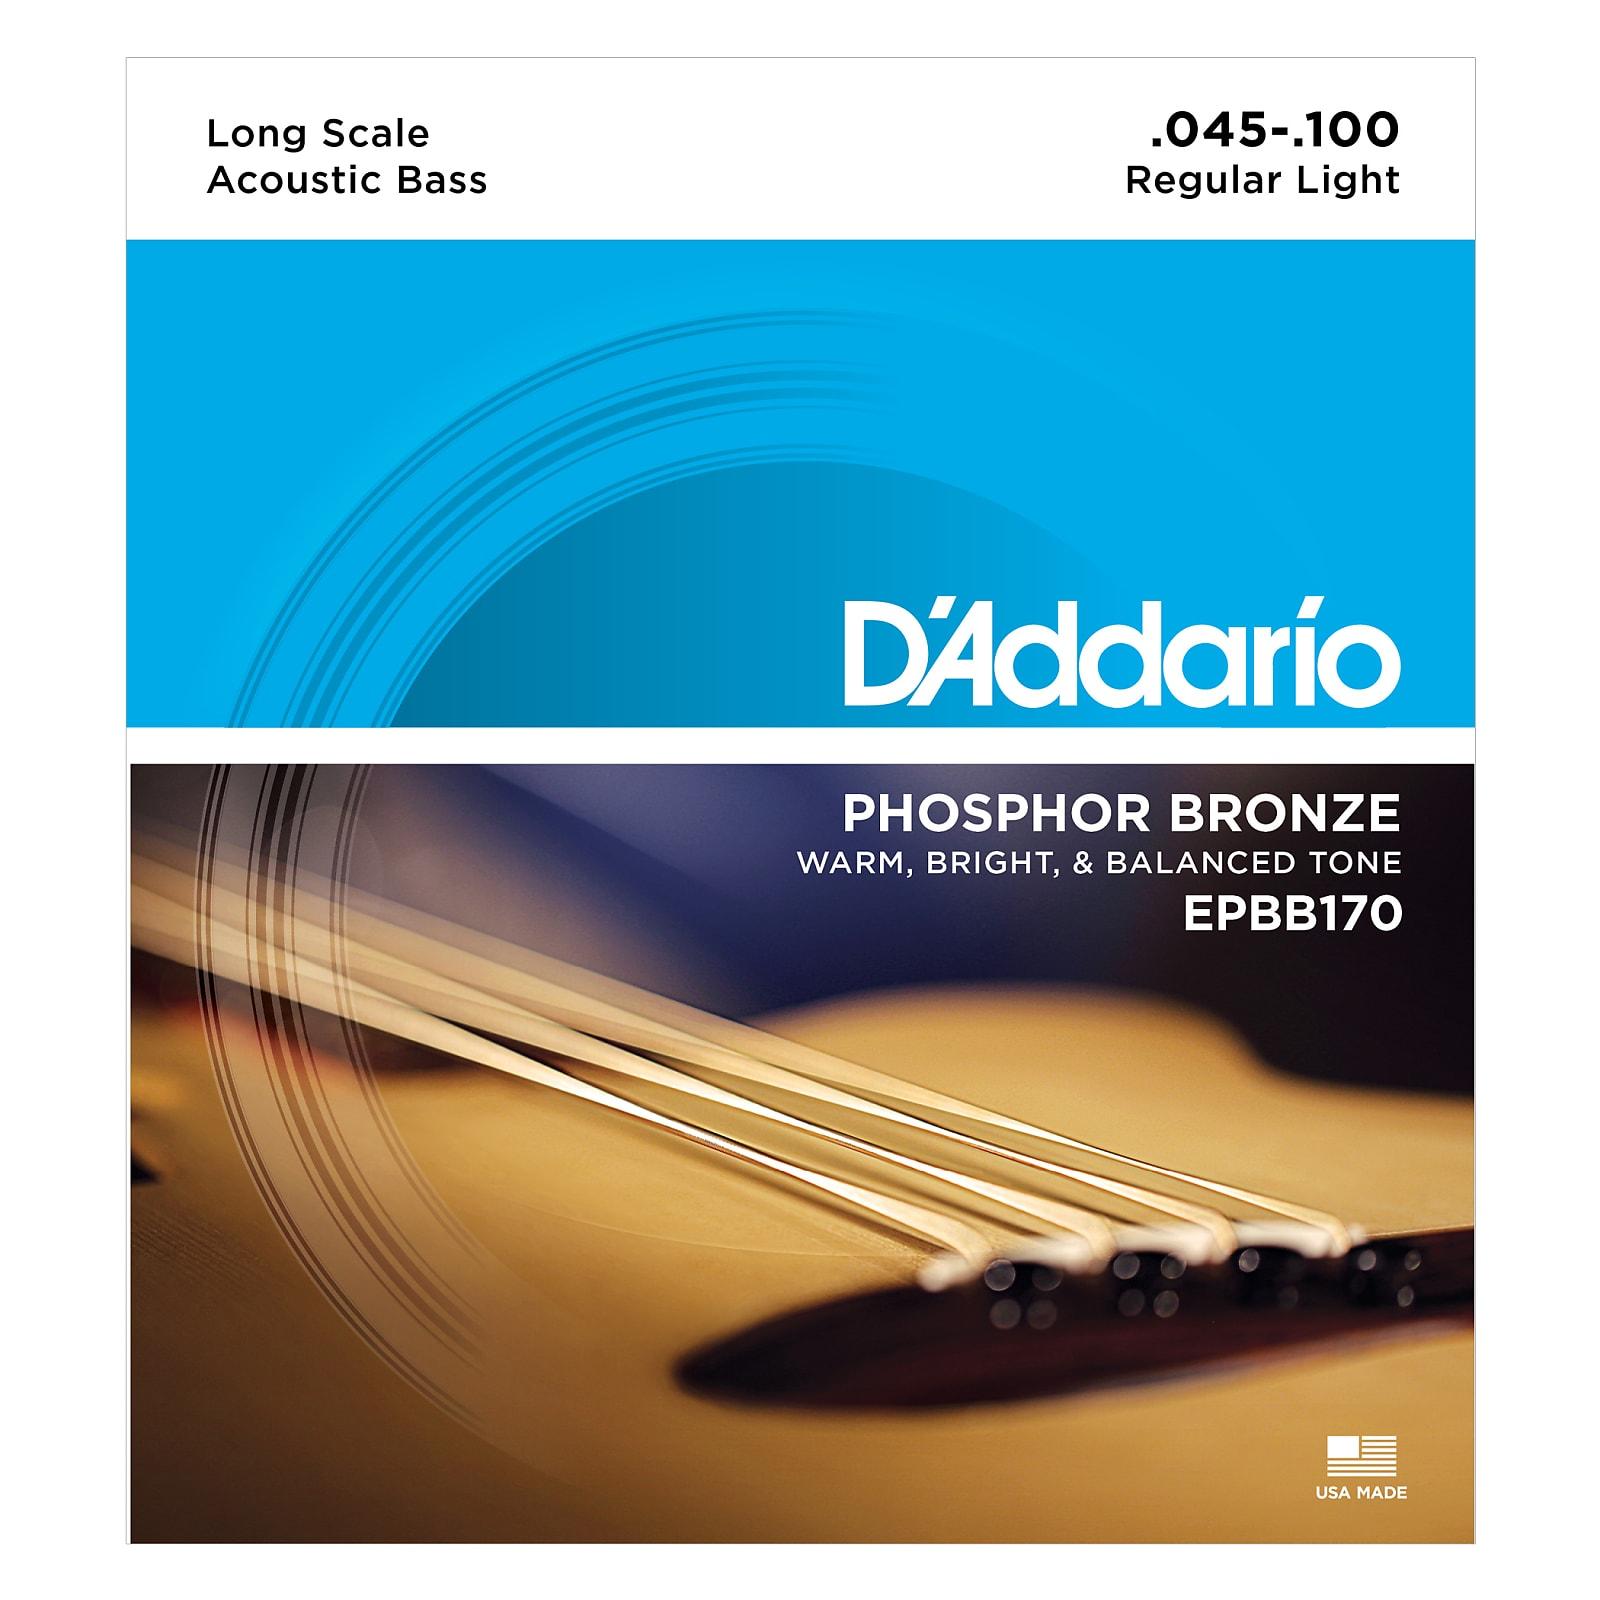 D'Addario EPBB170 Phosphor Bronze Acoustic Bass Guitar Strings, Long Scale, 45-